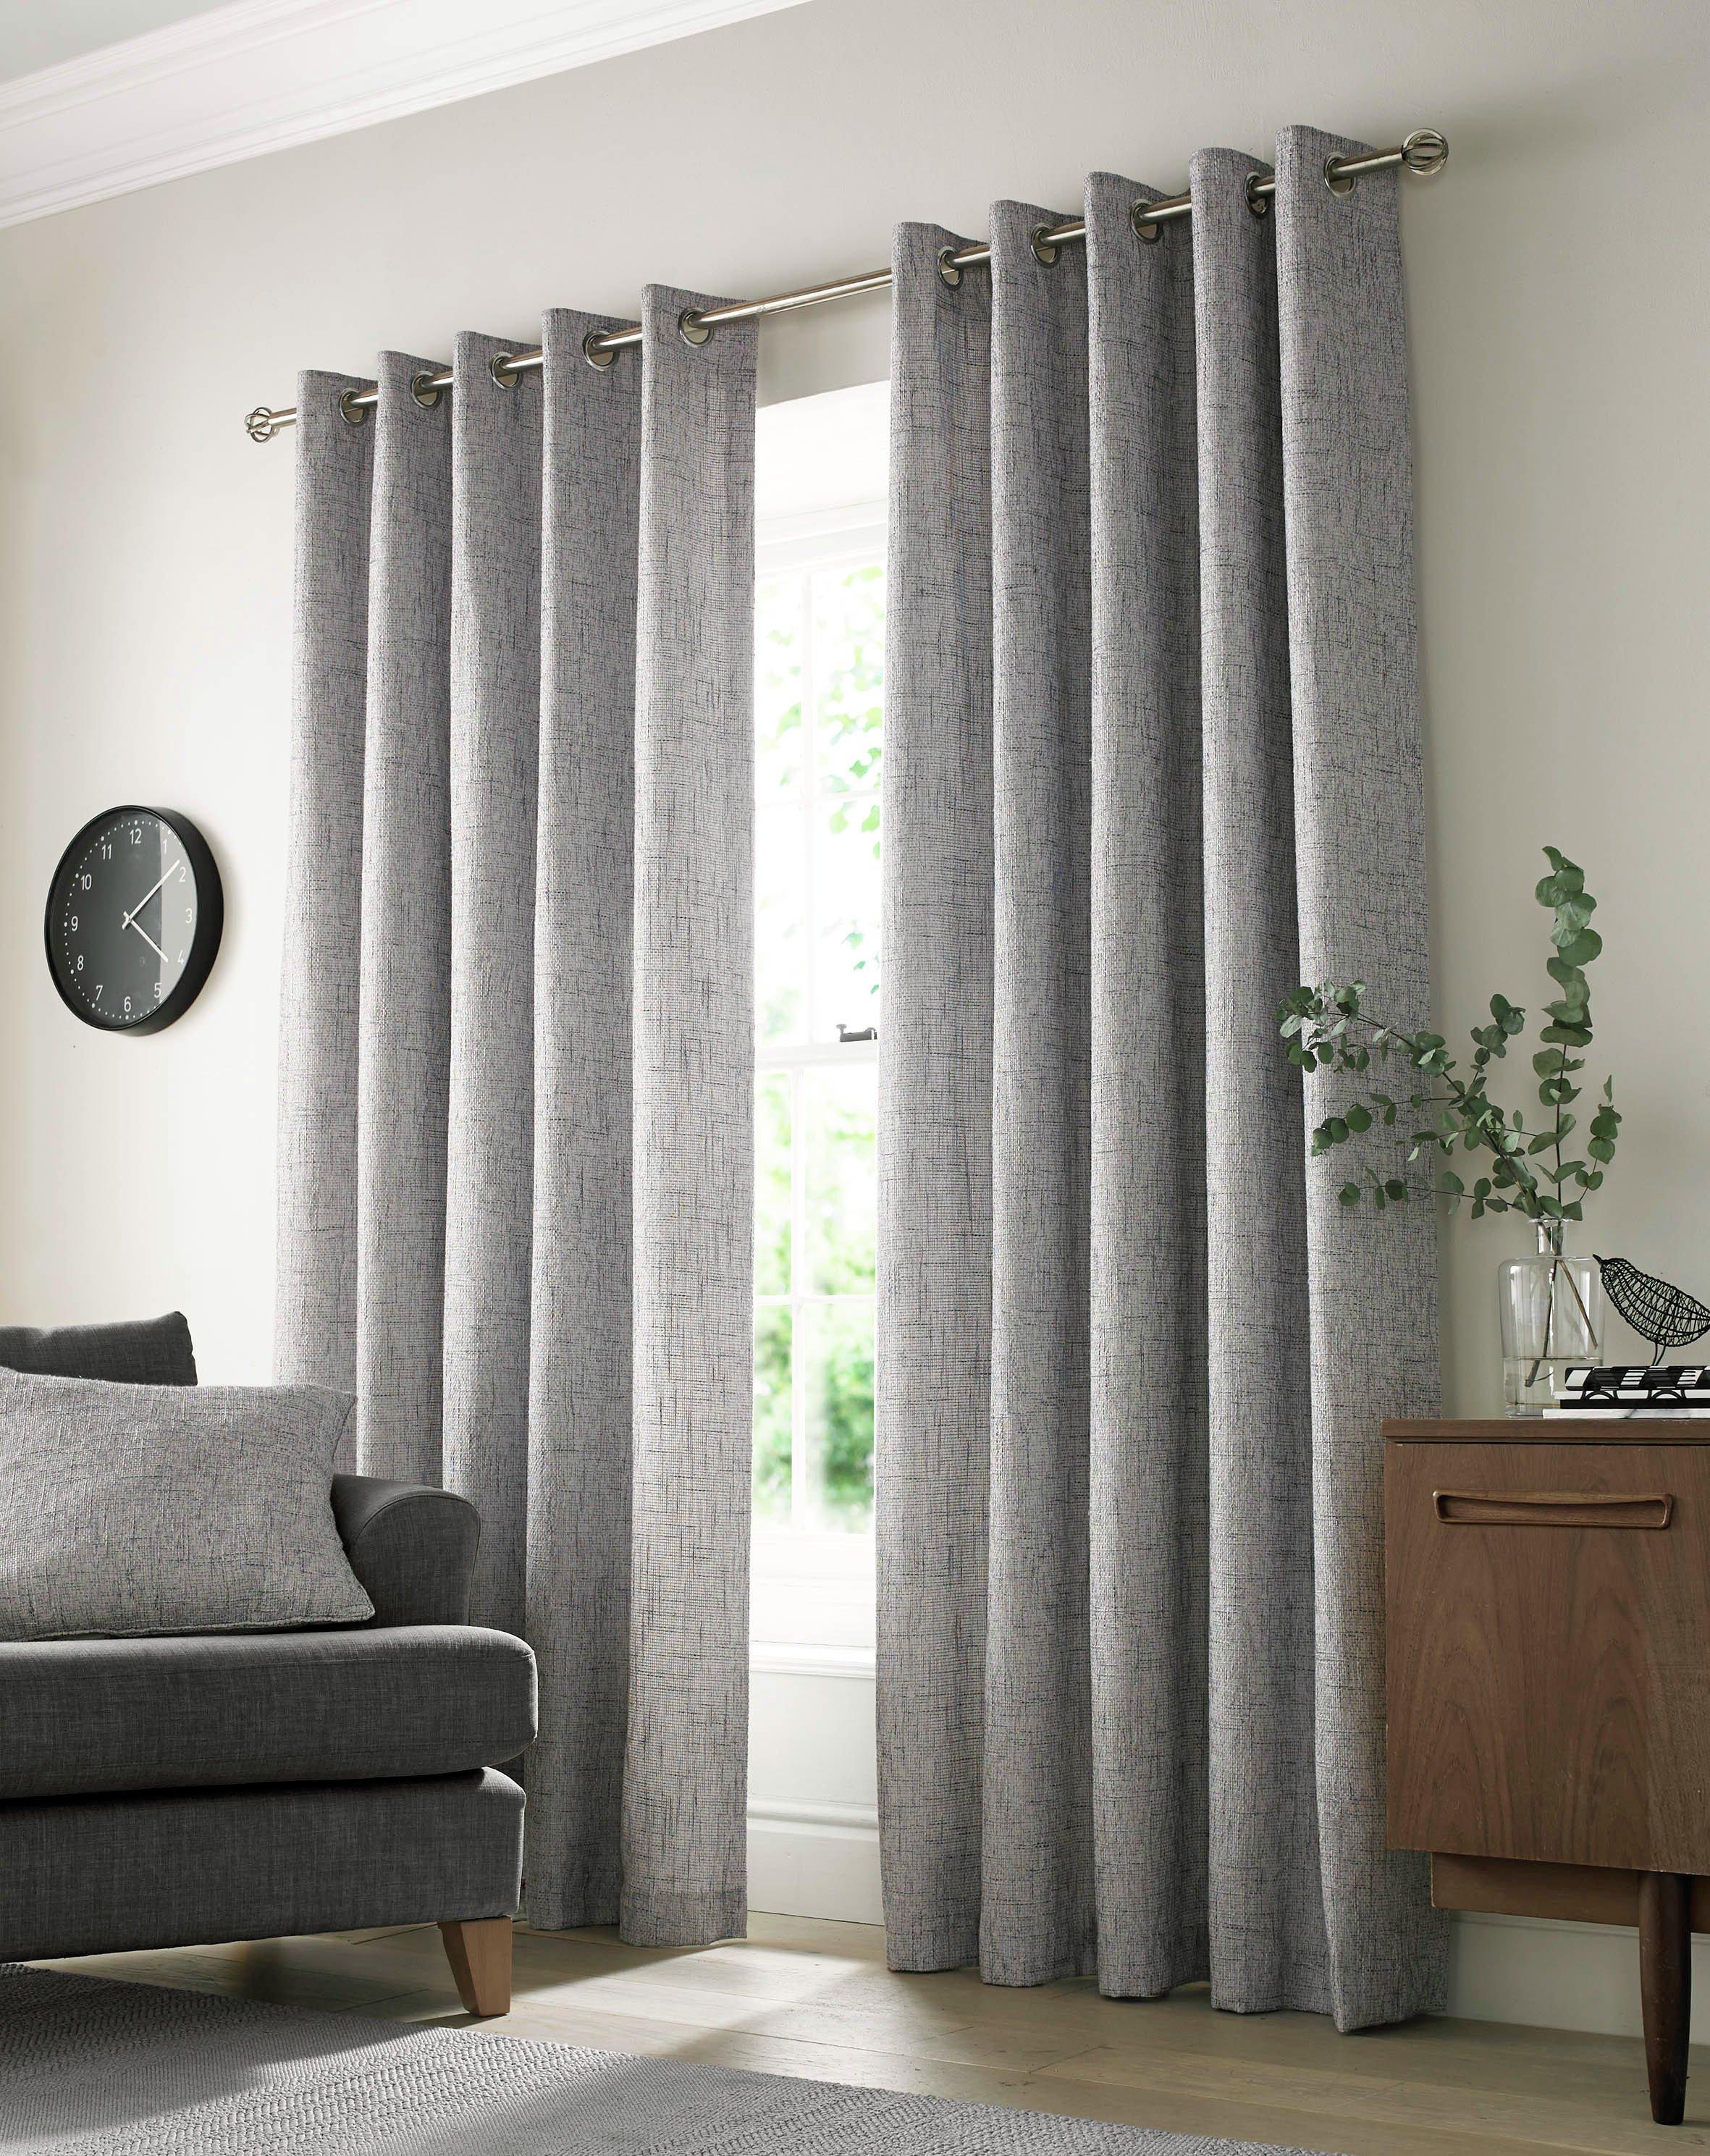 Academy Eyelet Curtains - 229x229cm - Grey.